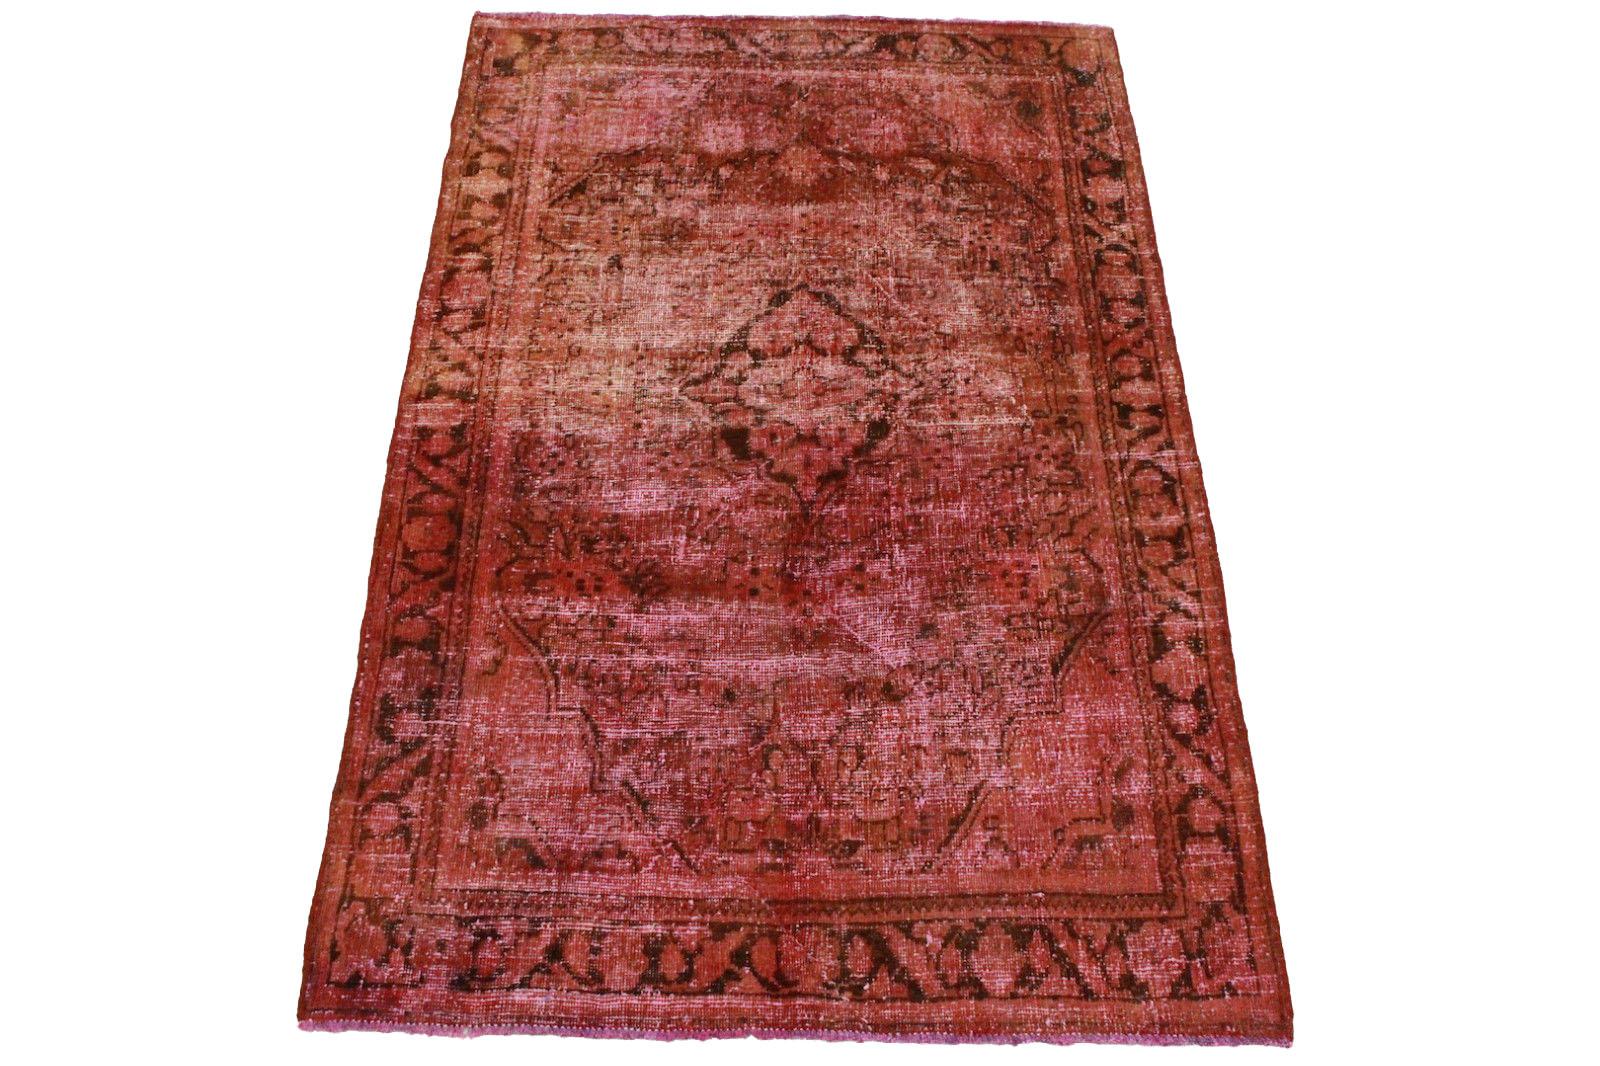 vintage teppich rot in 200x130cm 1001 3213 bei kaufen. Black Bedroom Furniture Sets. Home Design Ideas